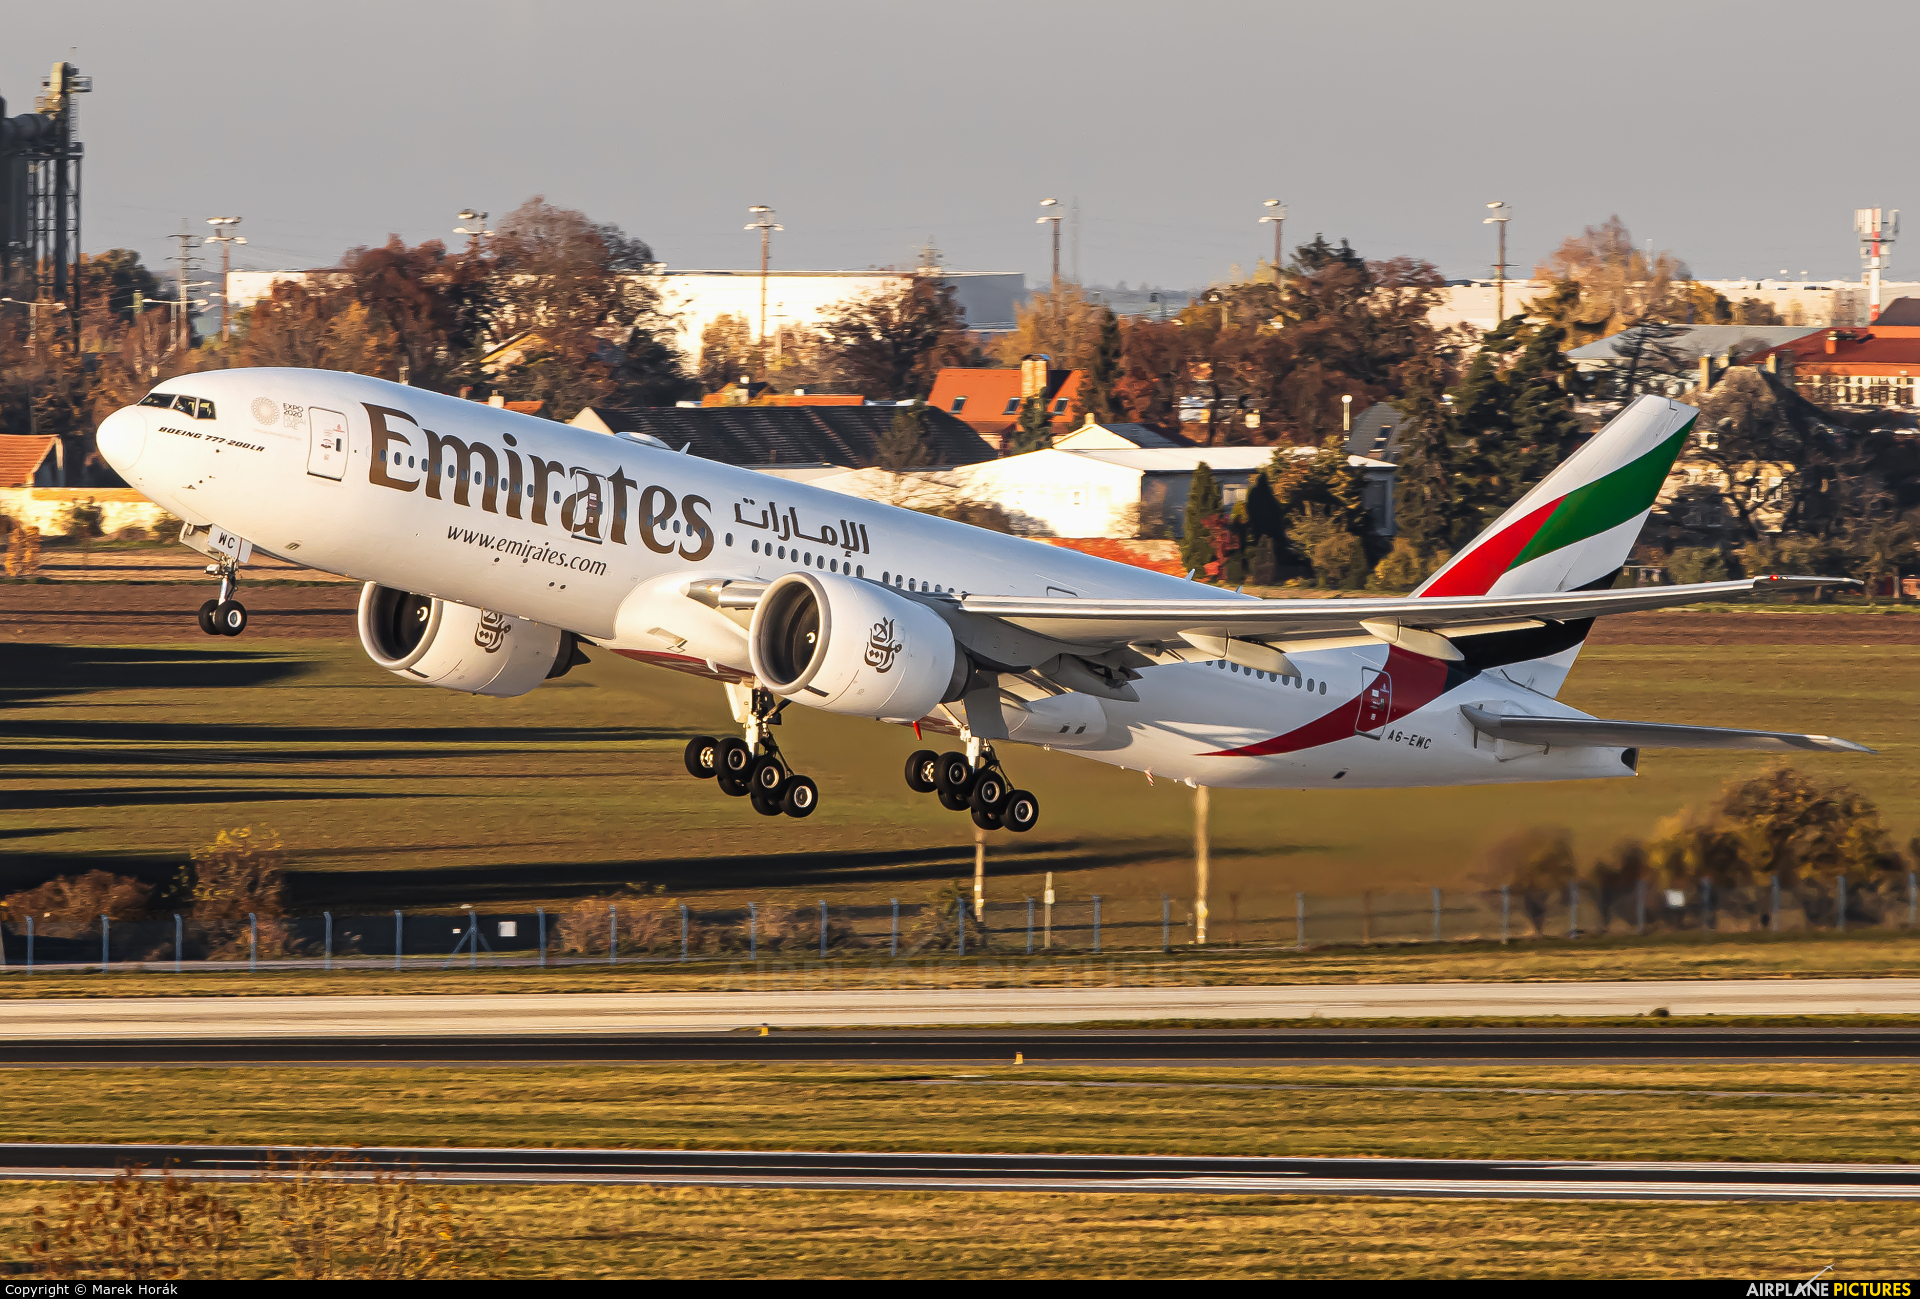 Emirates Airlines A6-EWC aircraft at Prague - Václav Havel